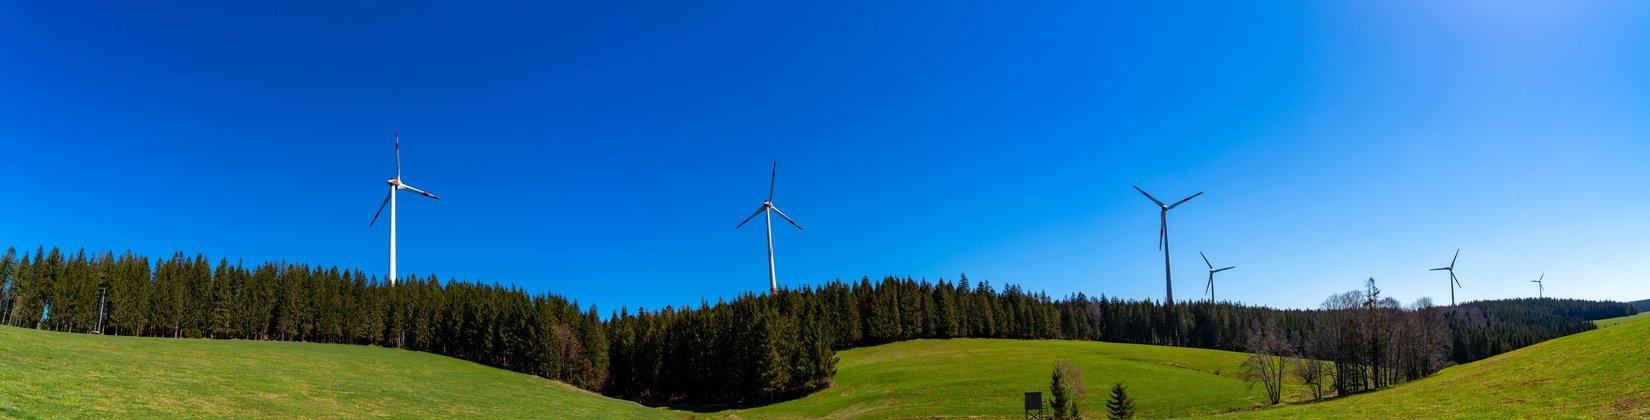 Windenergieanlagen St. Peter, ©Plattform EE BW, A. Jung